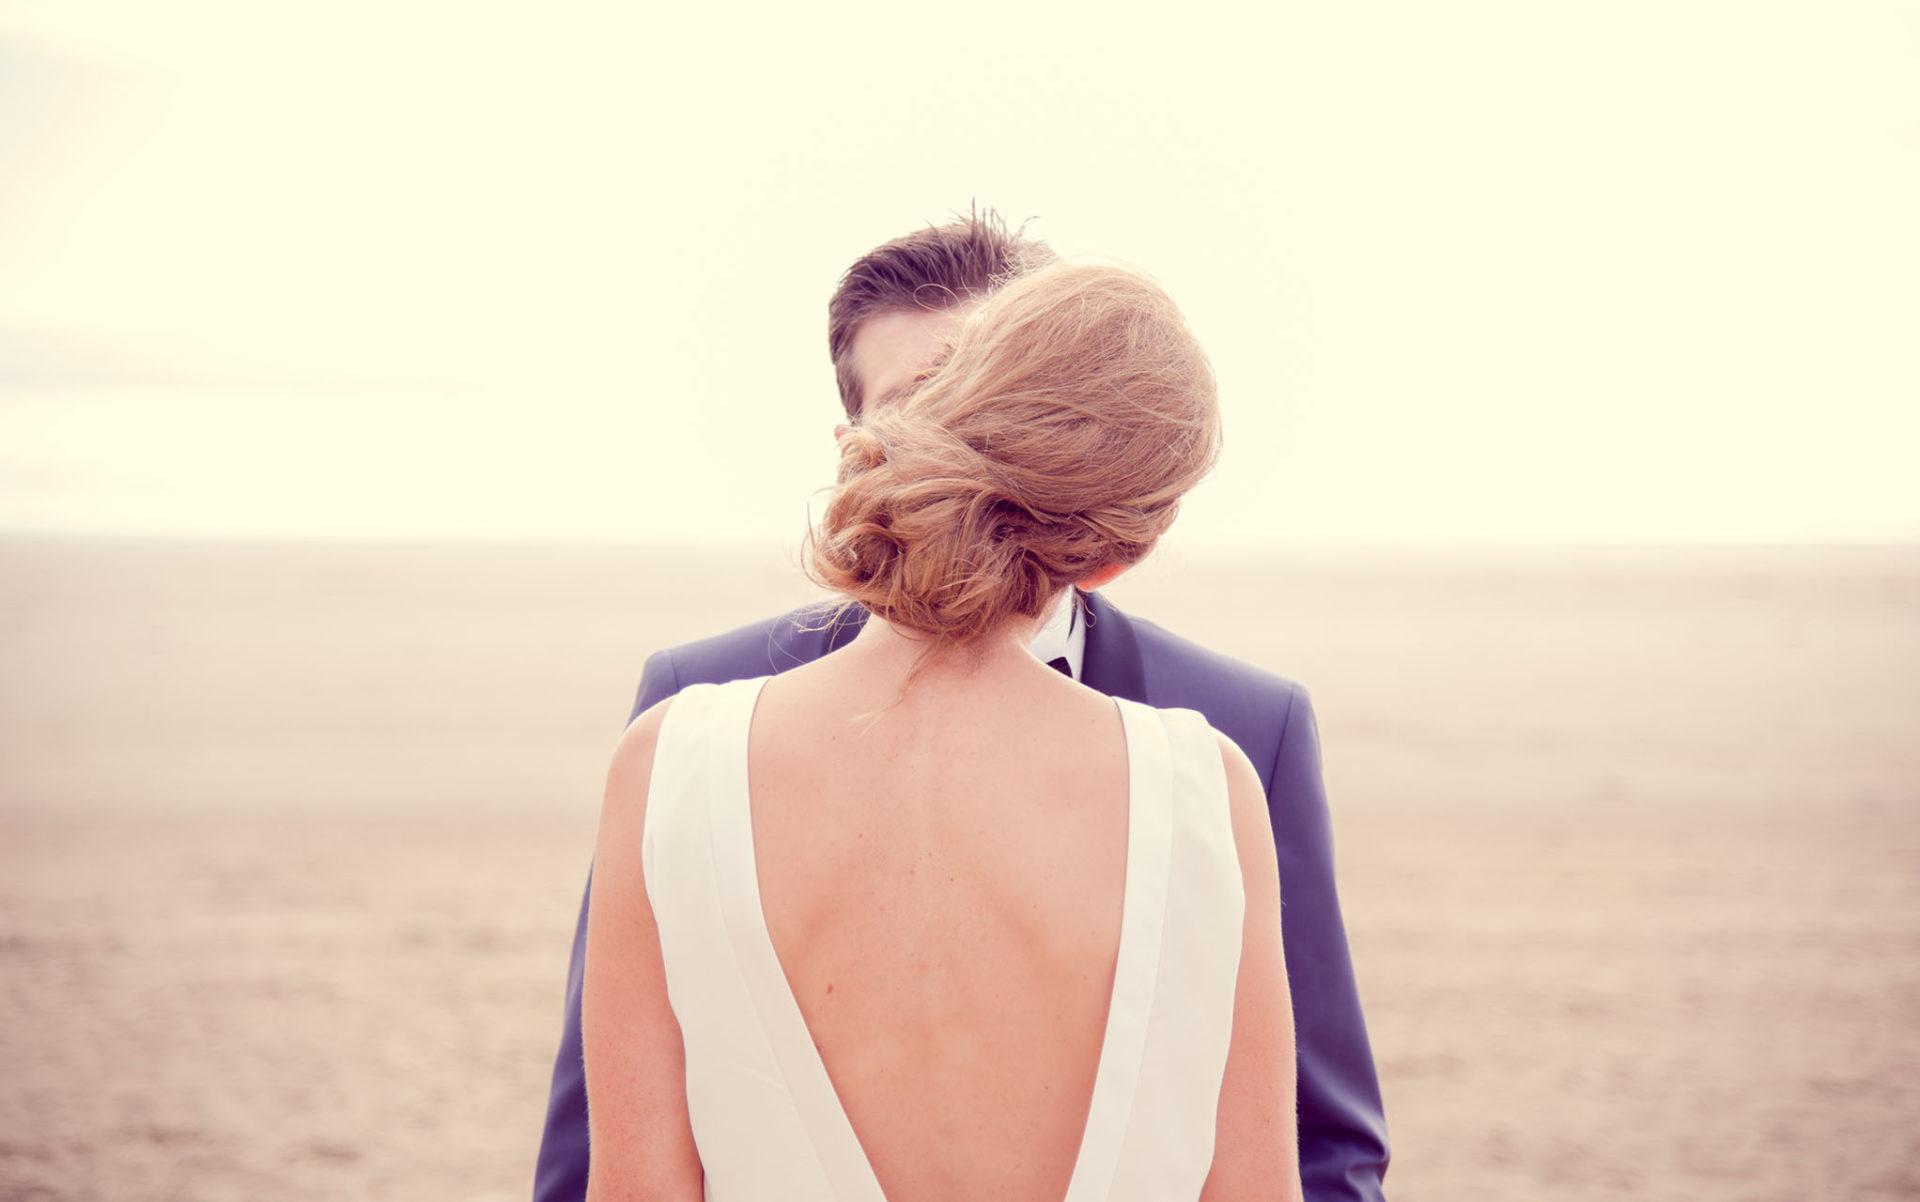 photographe-ile-de-france-mariage-yasmine-philippe-paris